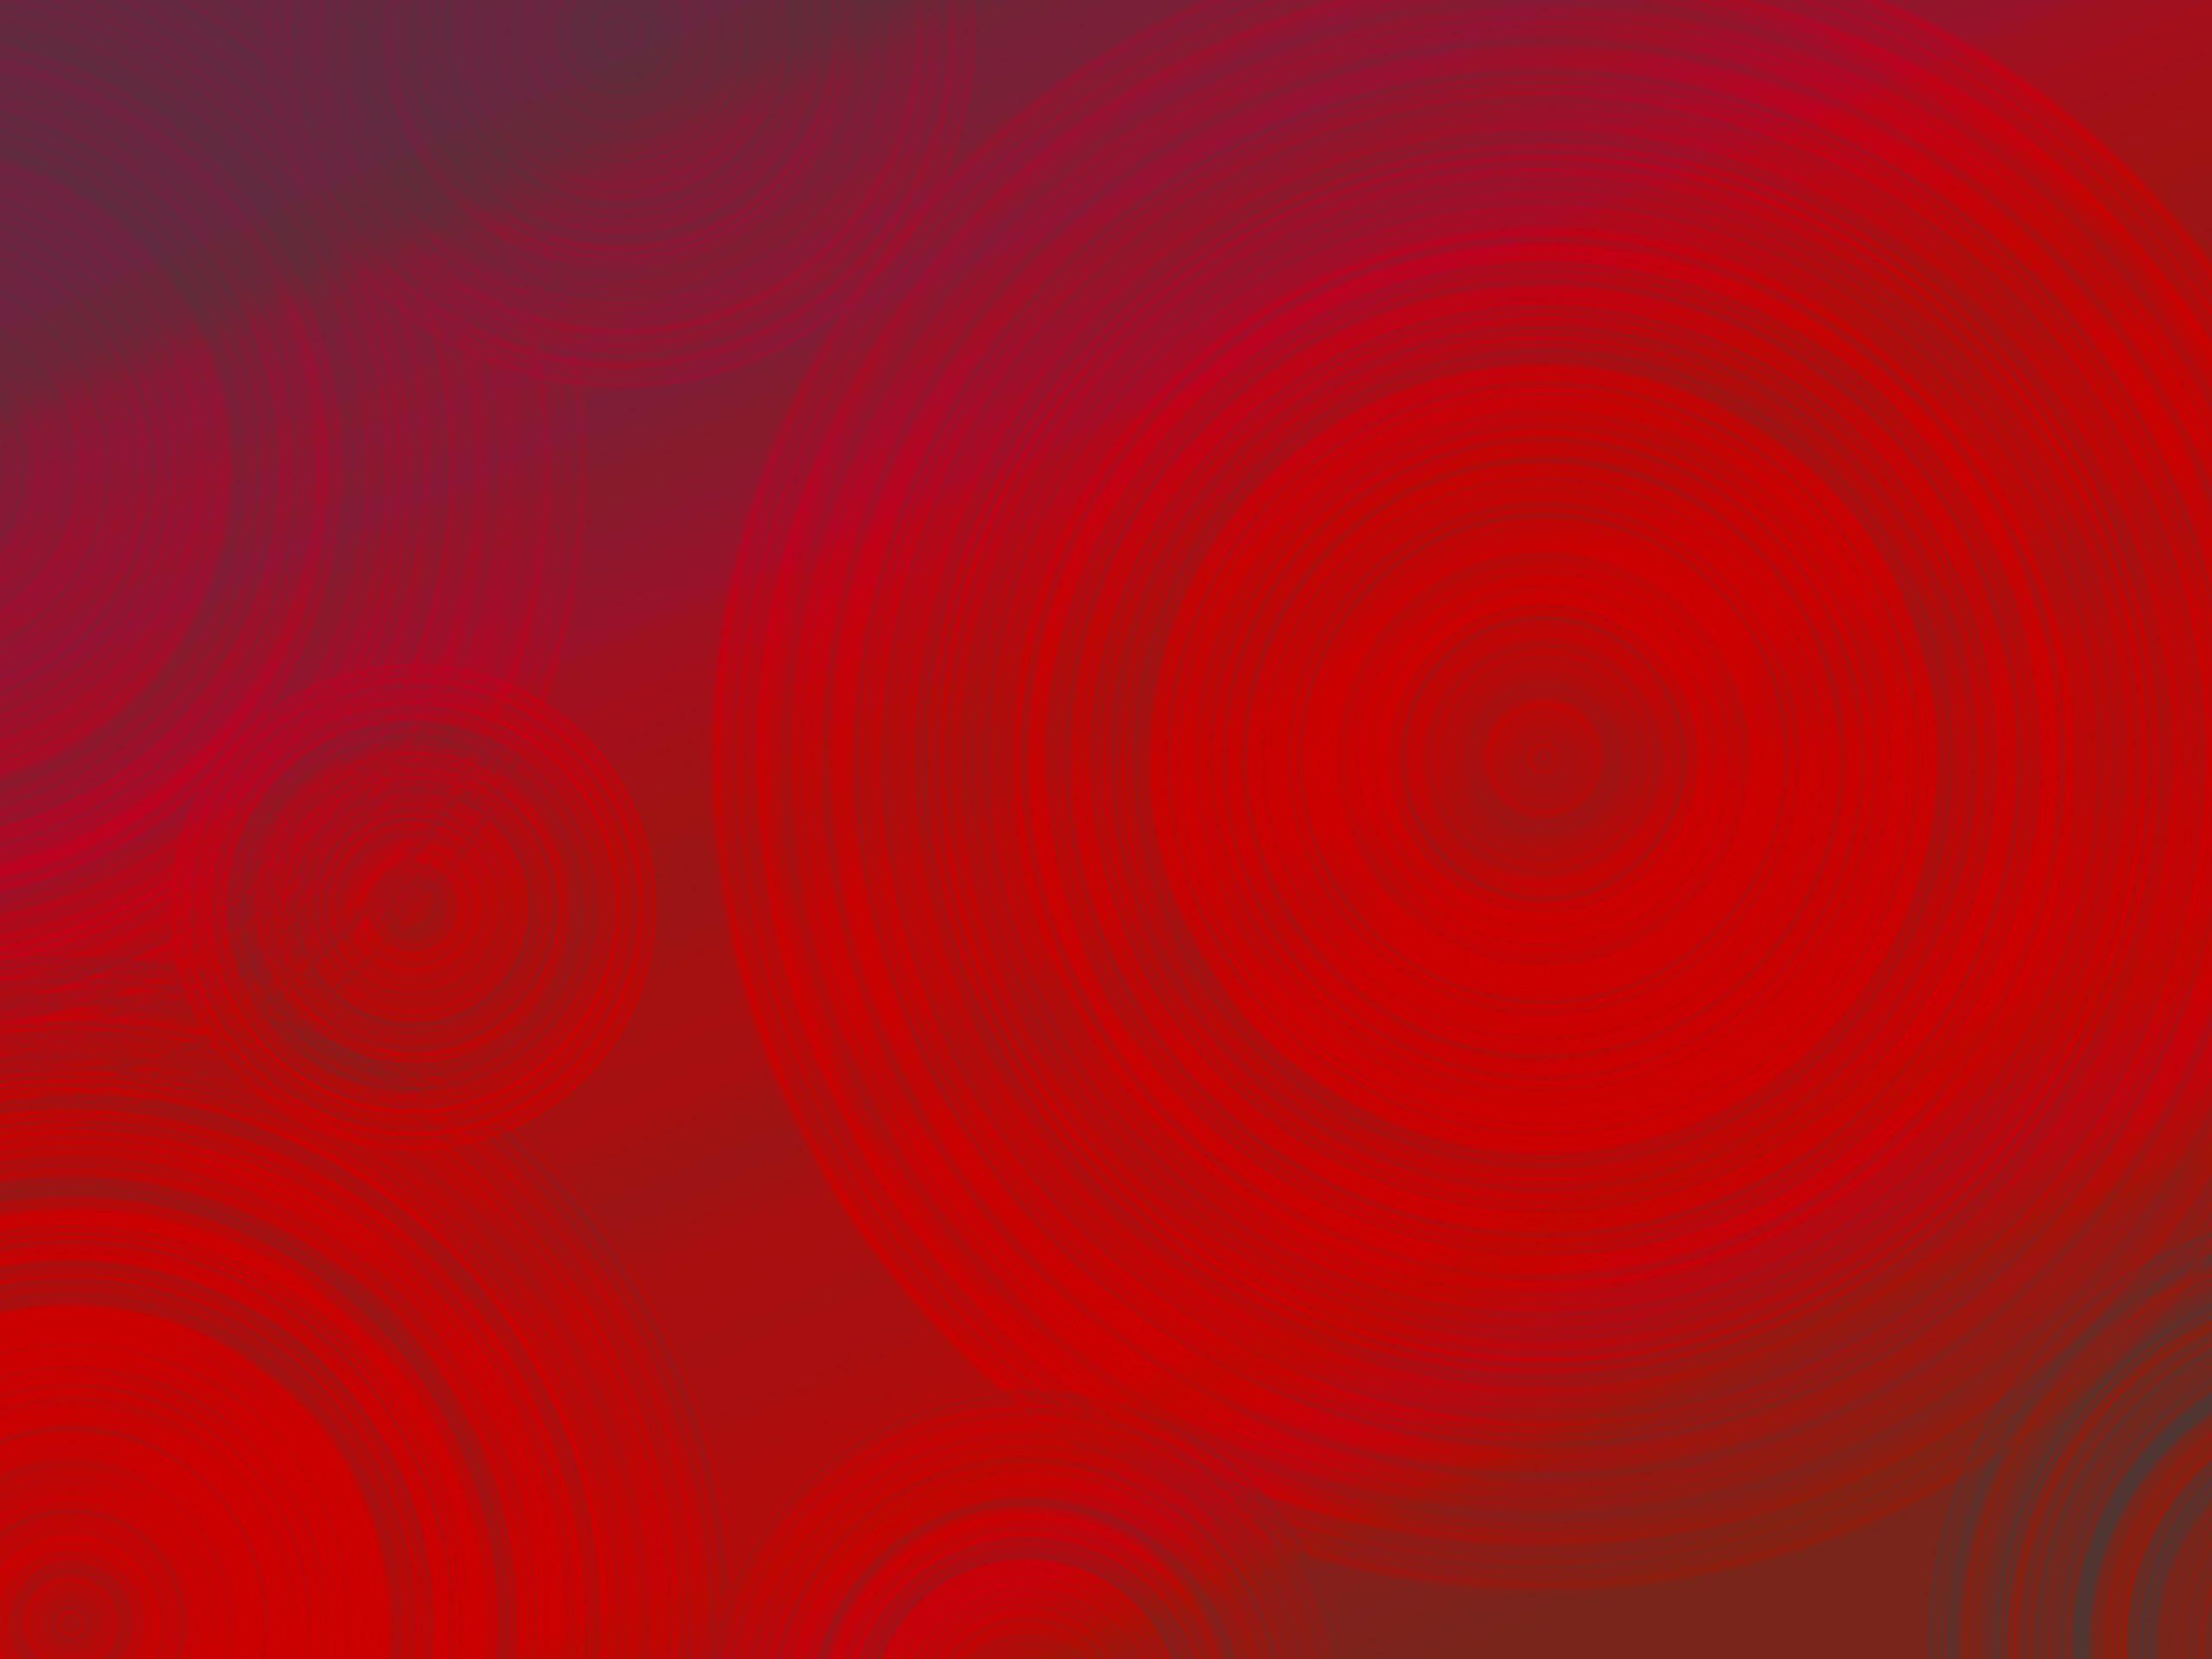 Disc shaped pattern